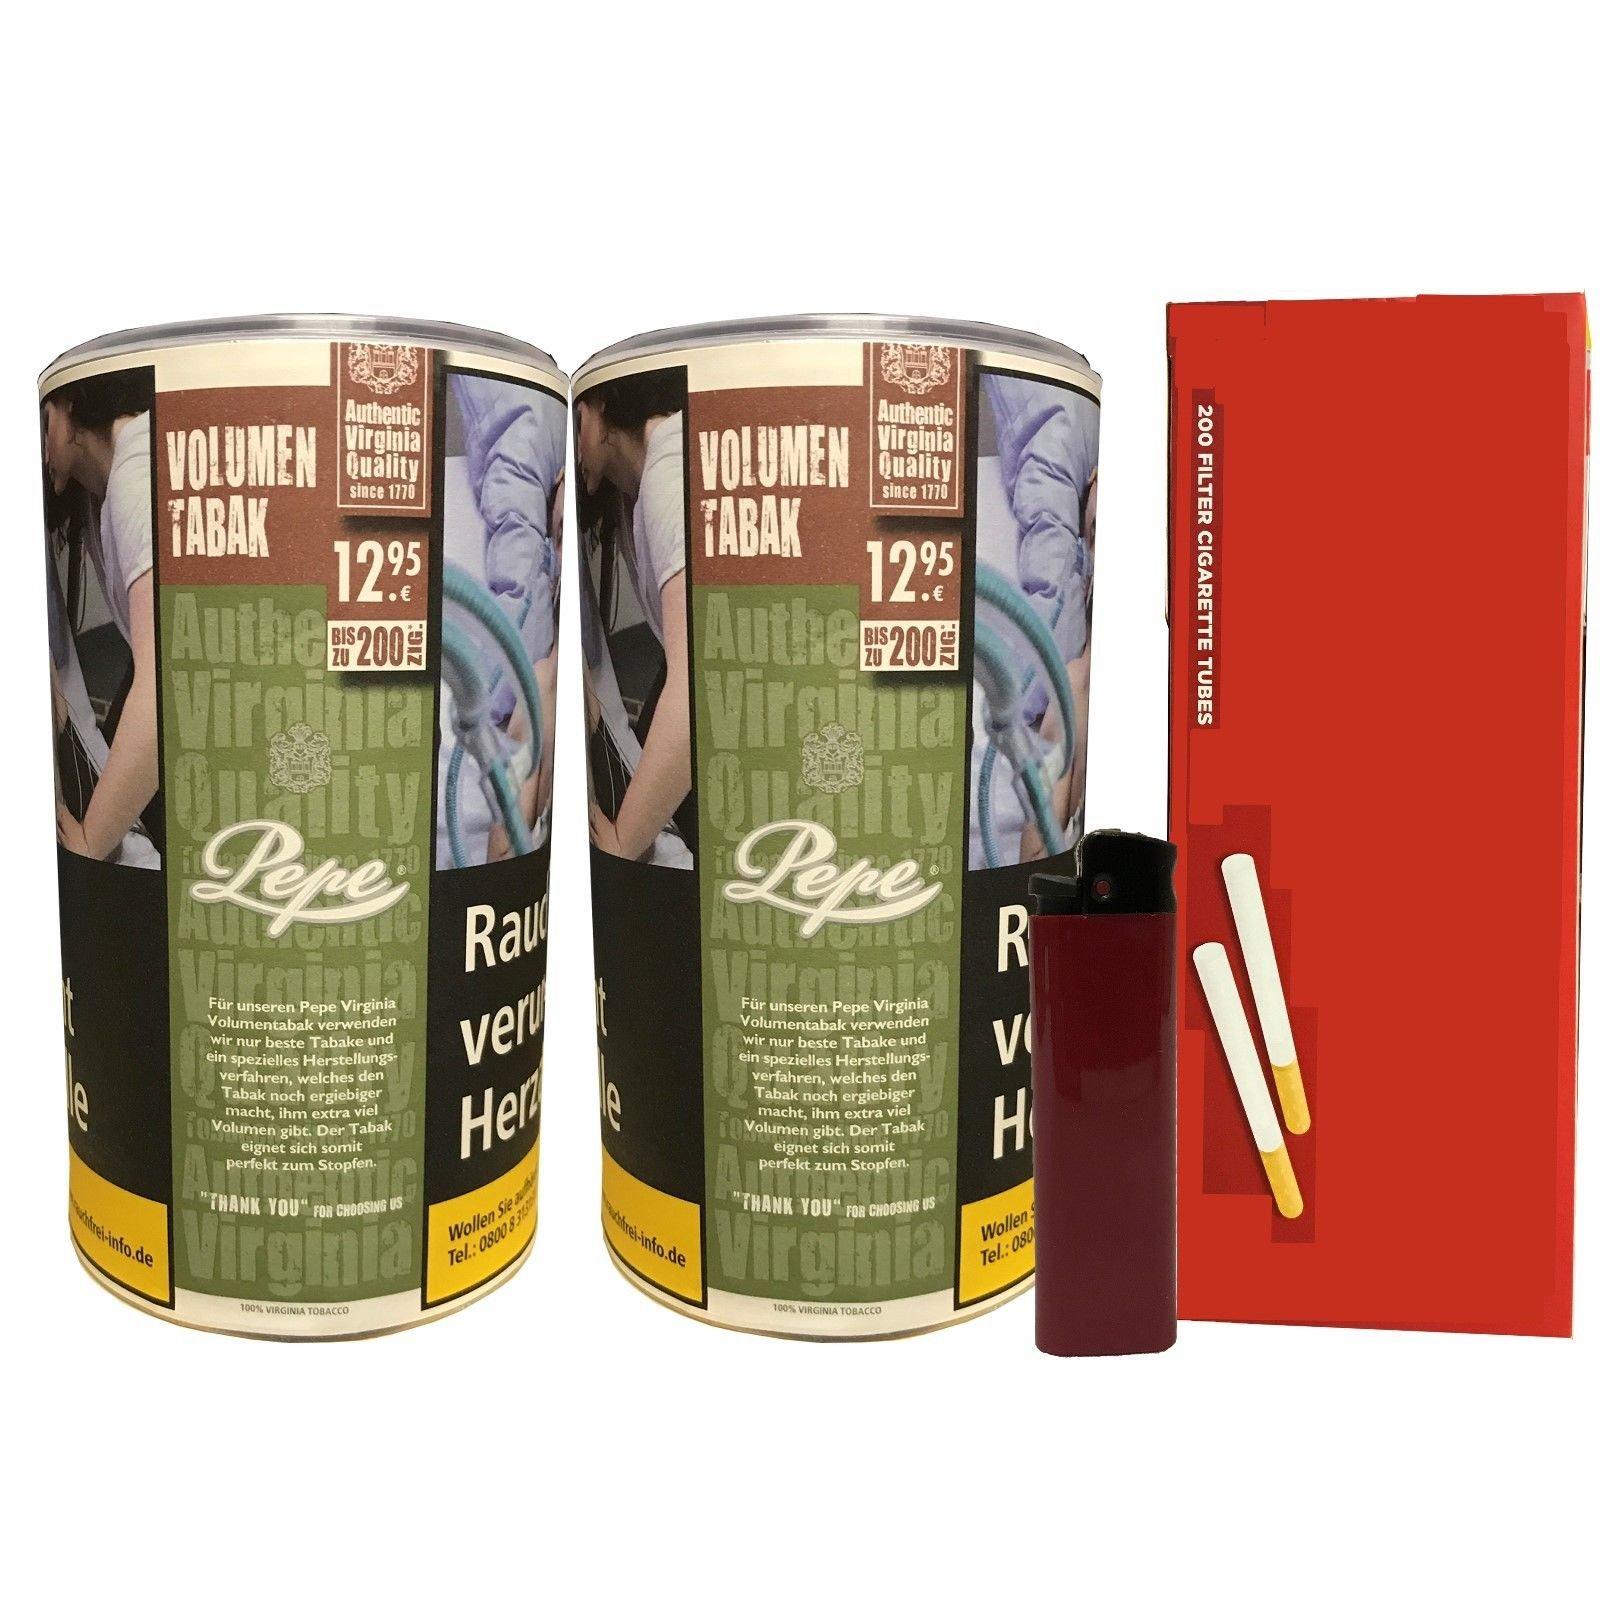 2x Pepe Rich Green Tabak / Volumentabak 85g + Feuerzeug + 200 Filterhülsen